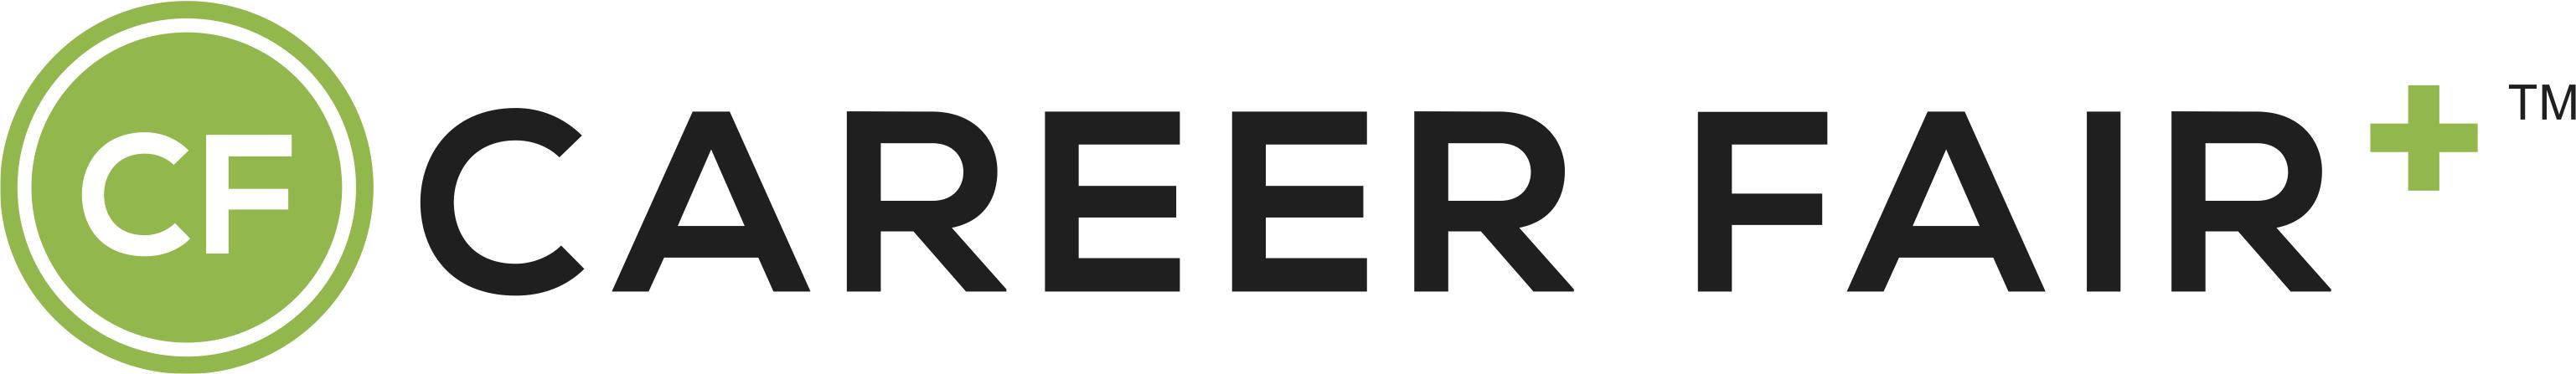 green-logo-for-google-form.png